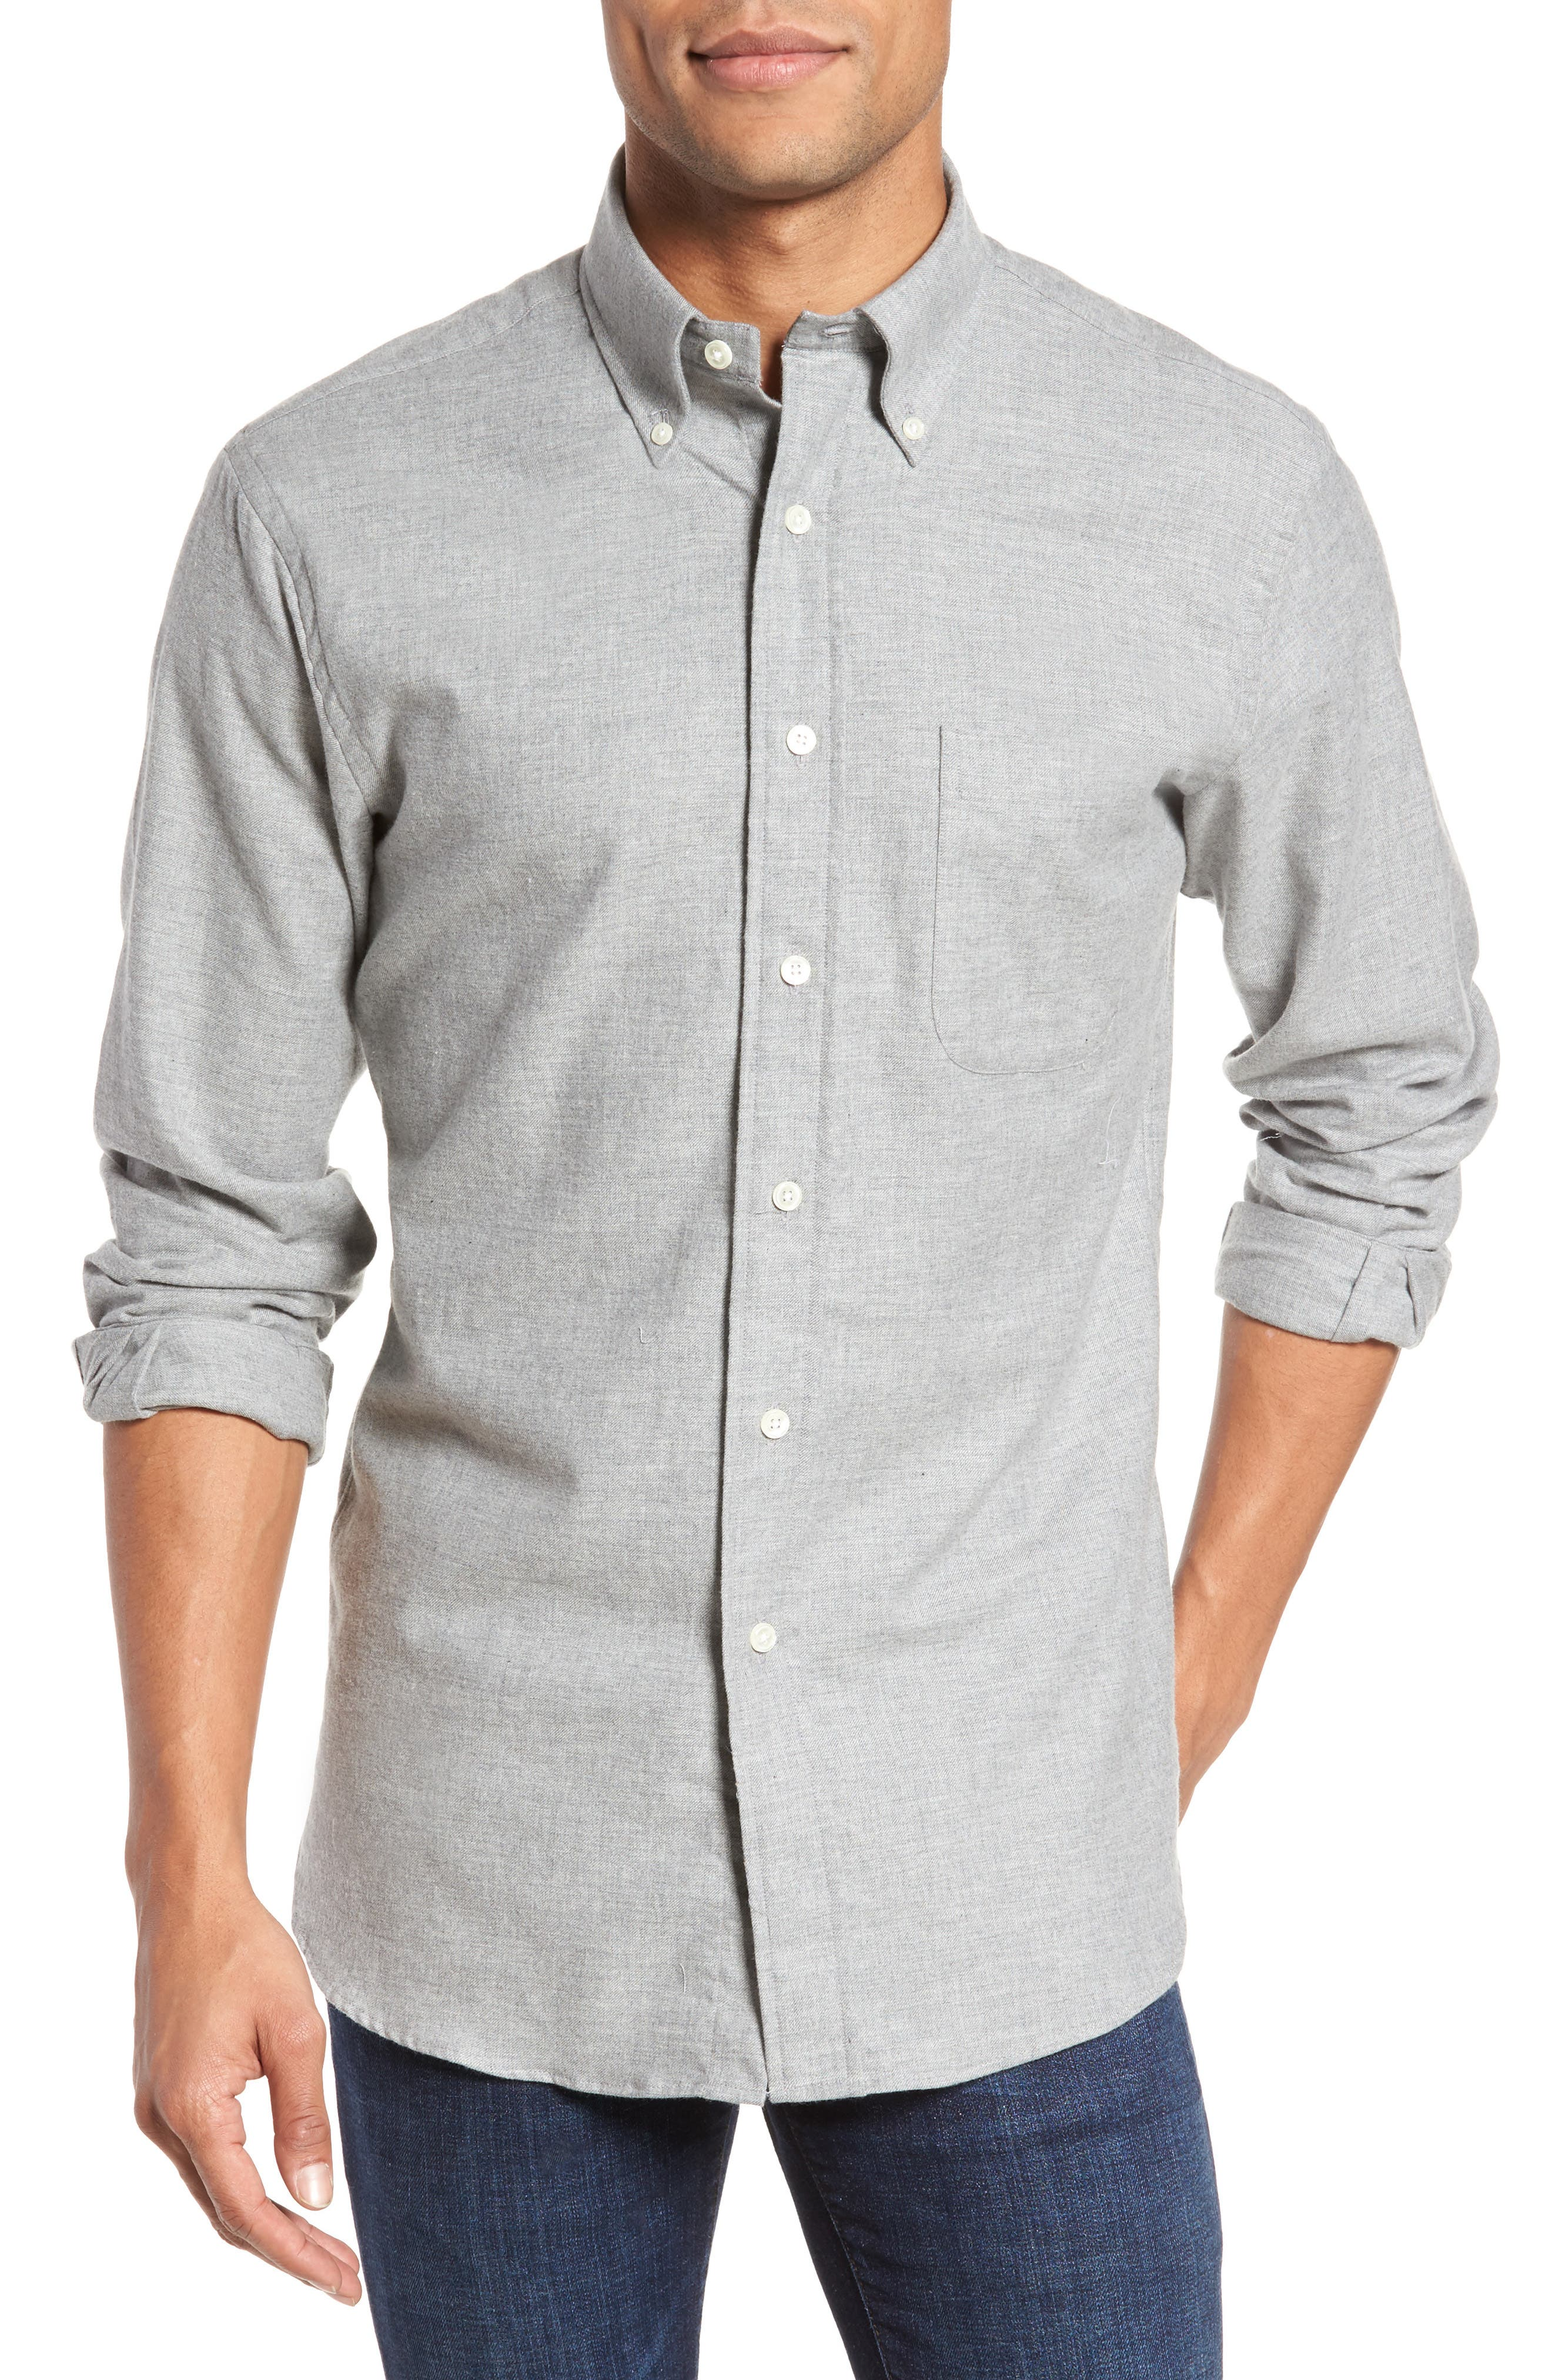 New England Shirt Co. Slim Fit Sport Shirt